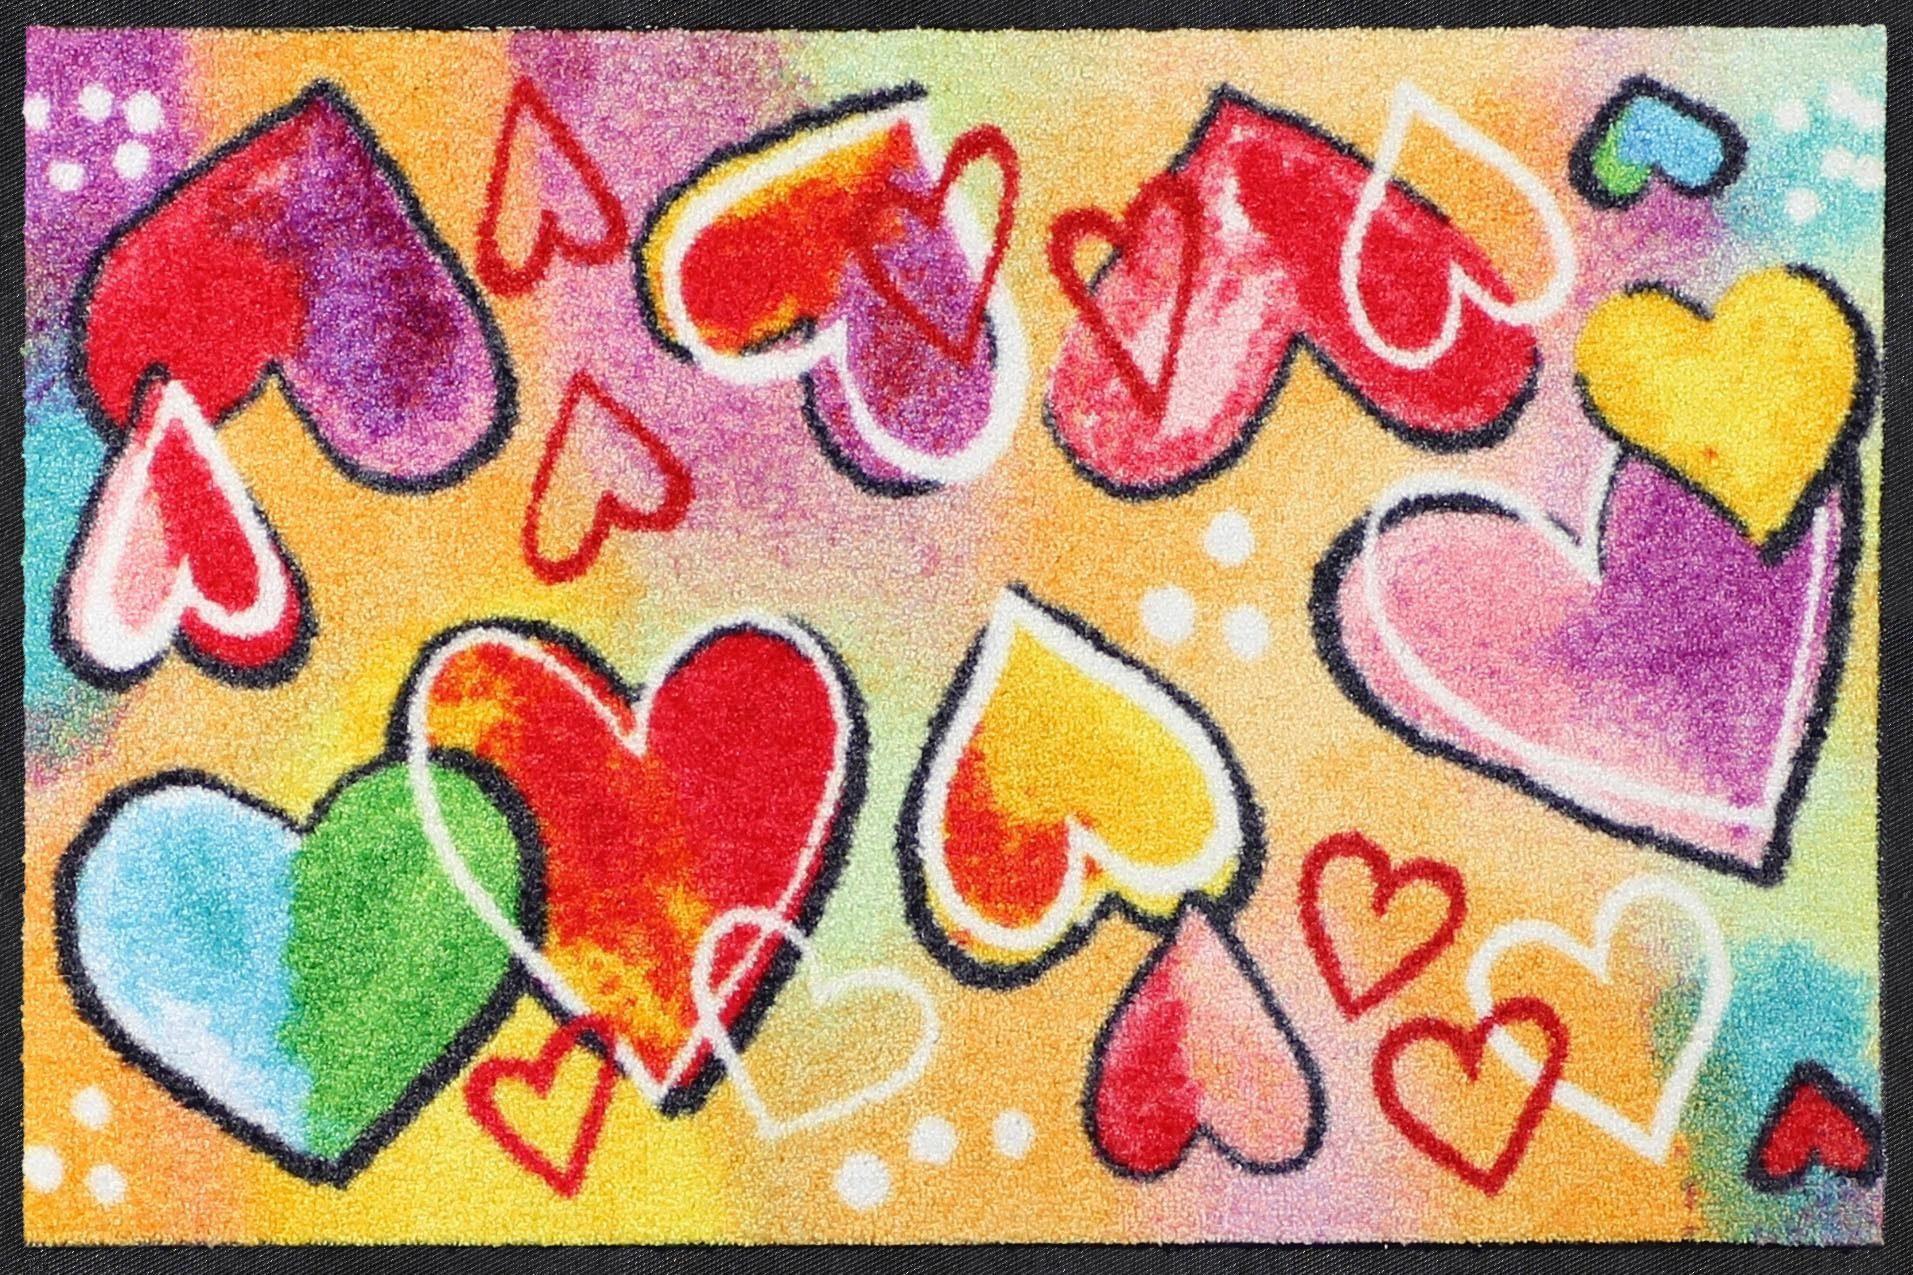 Fußmatte »Heartbeat«, Salonloewe, rechteckig, Höhe 7 mm